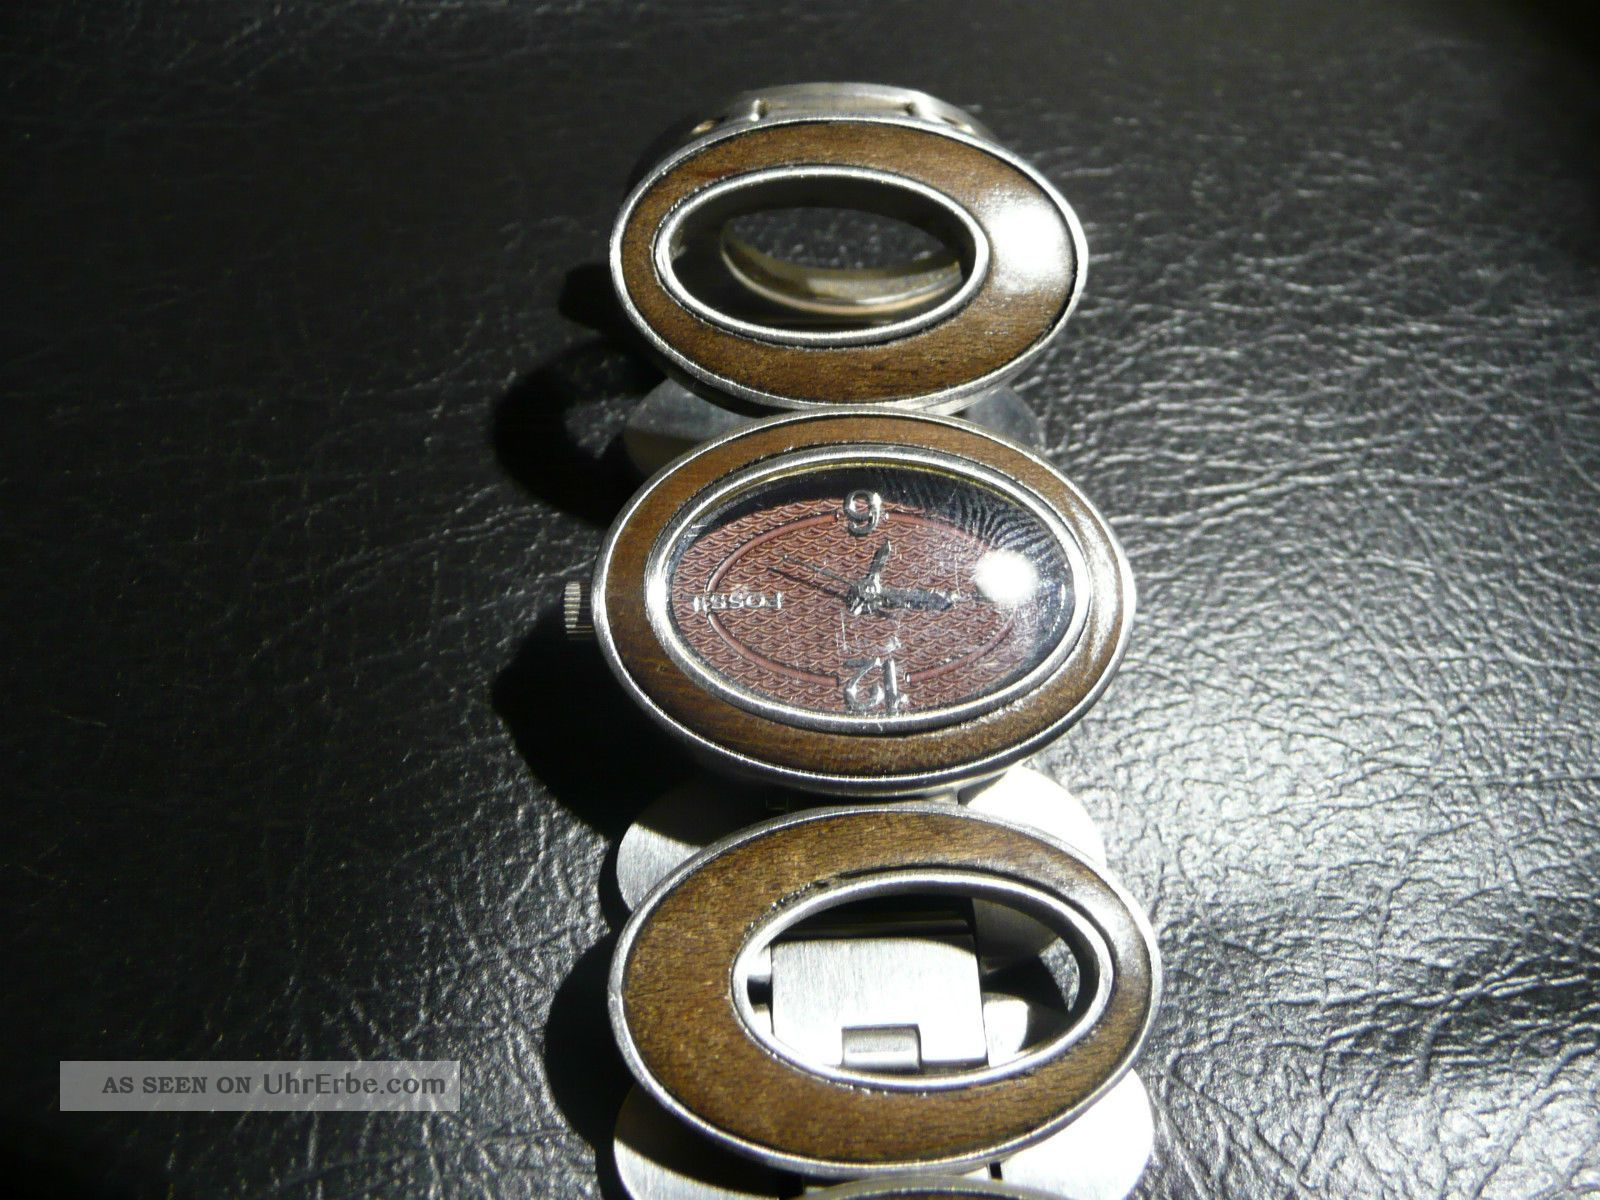 Fossil Armbanduhr Damen Holz ~ Fossil Damen Uhr Armbanduhr Holz Armbanduhren Bild